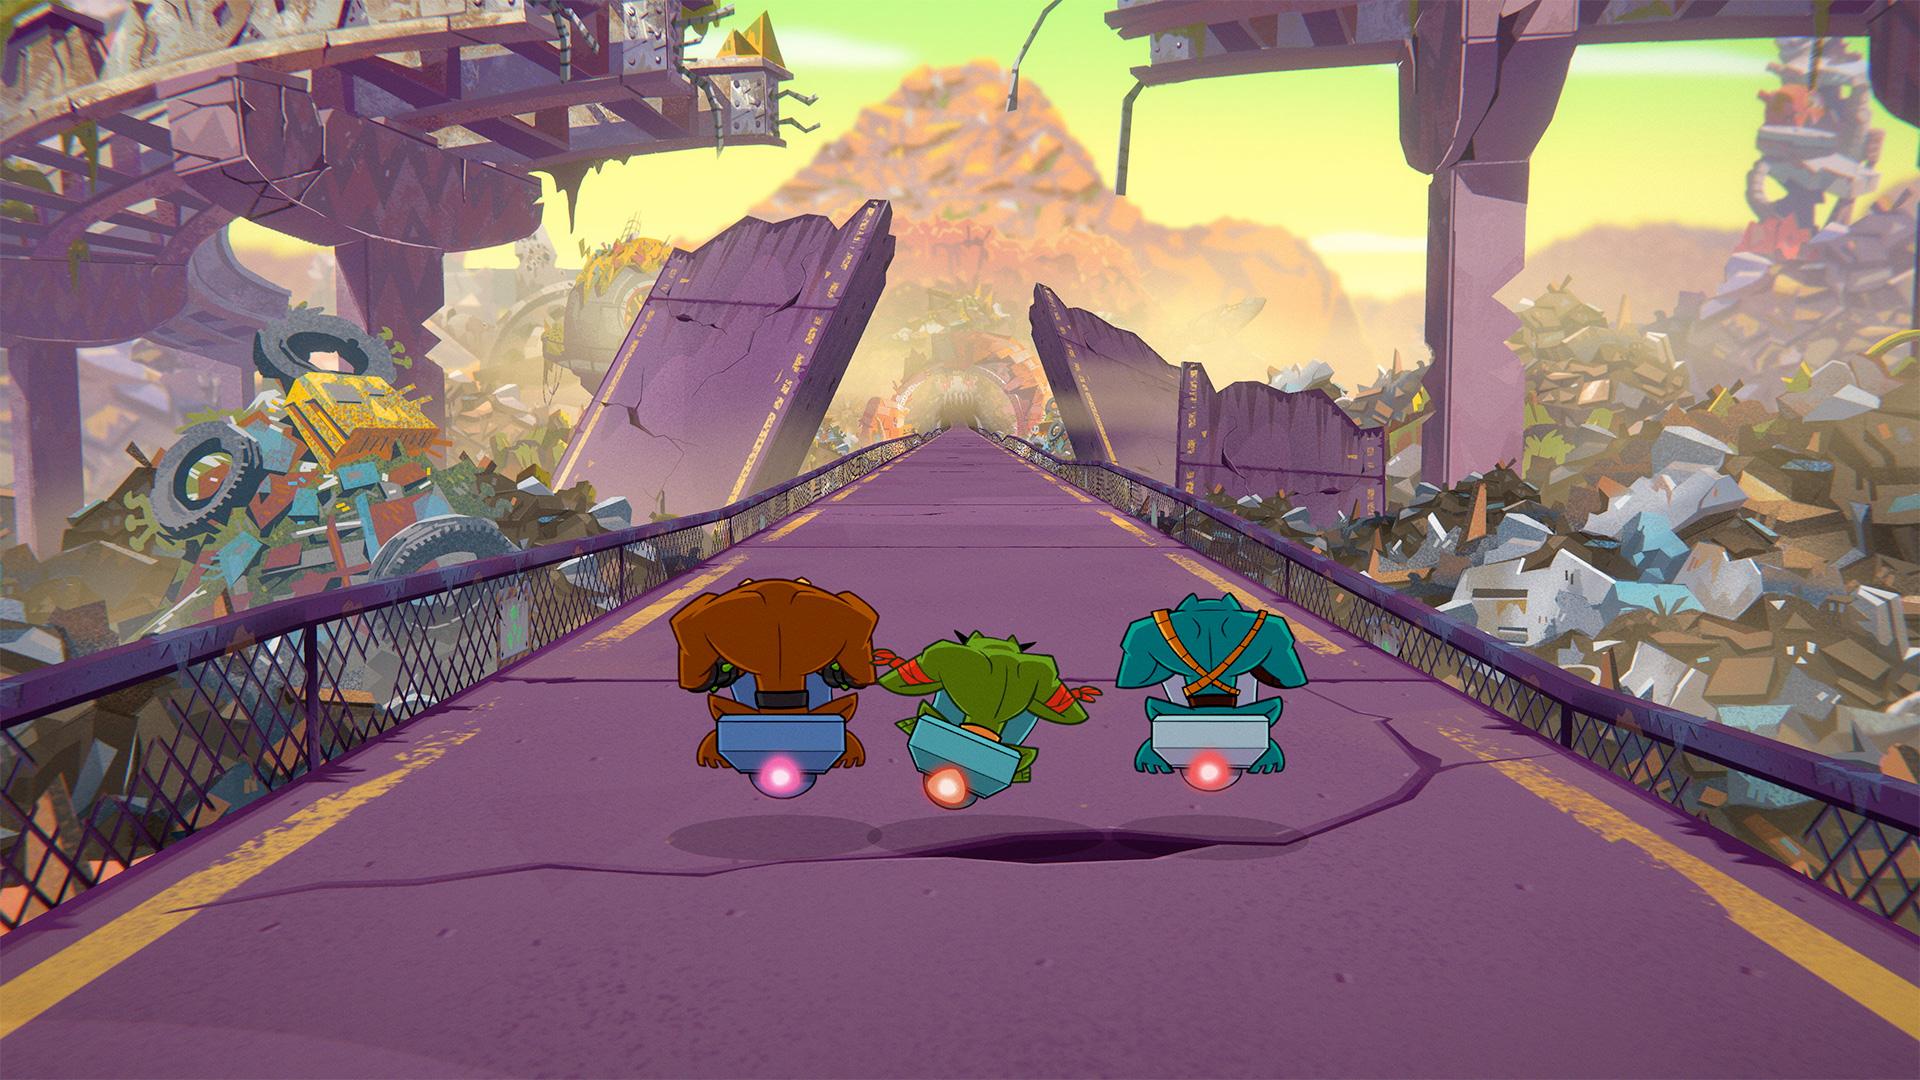 Battletoads Xbox One level hoverbike